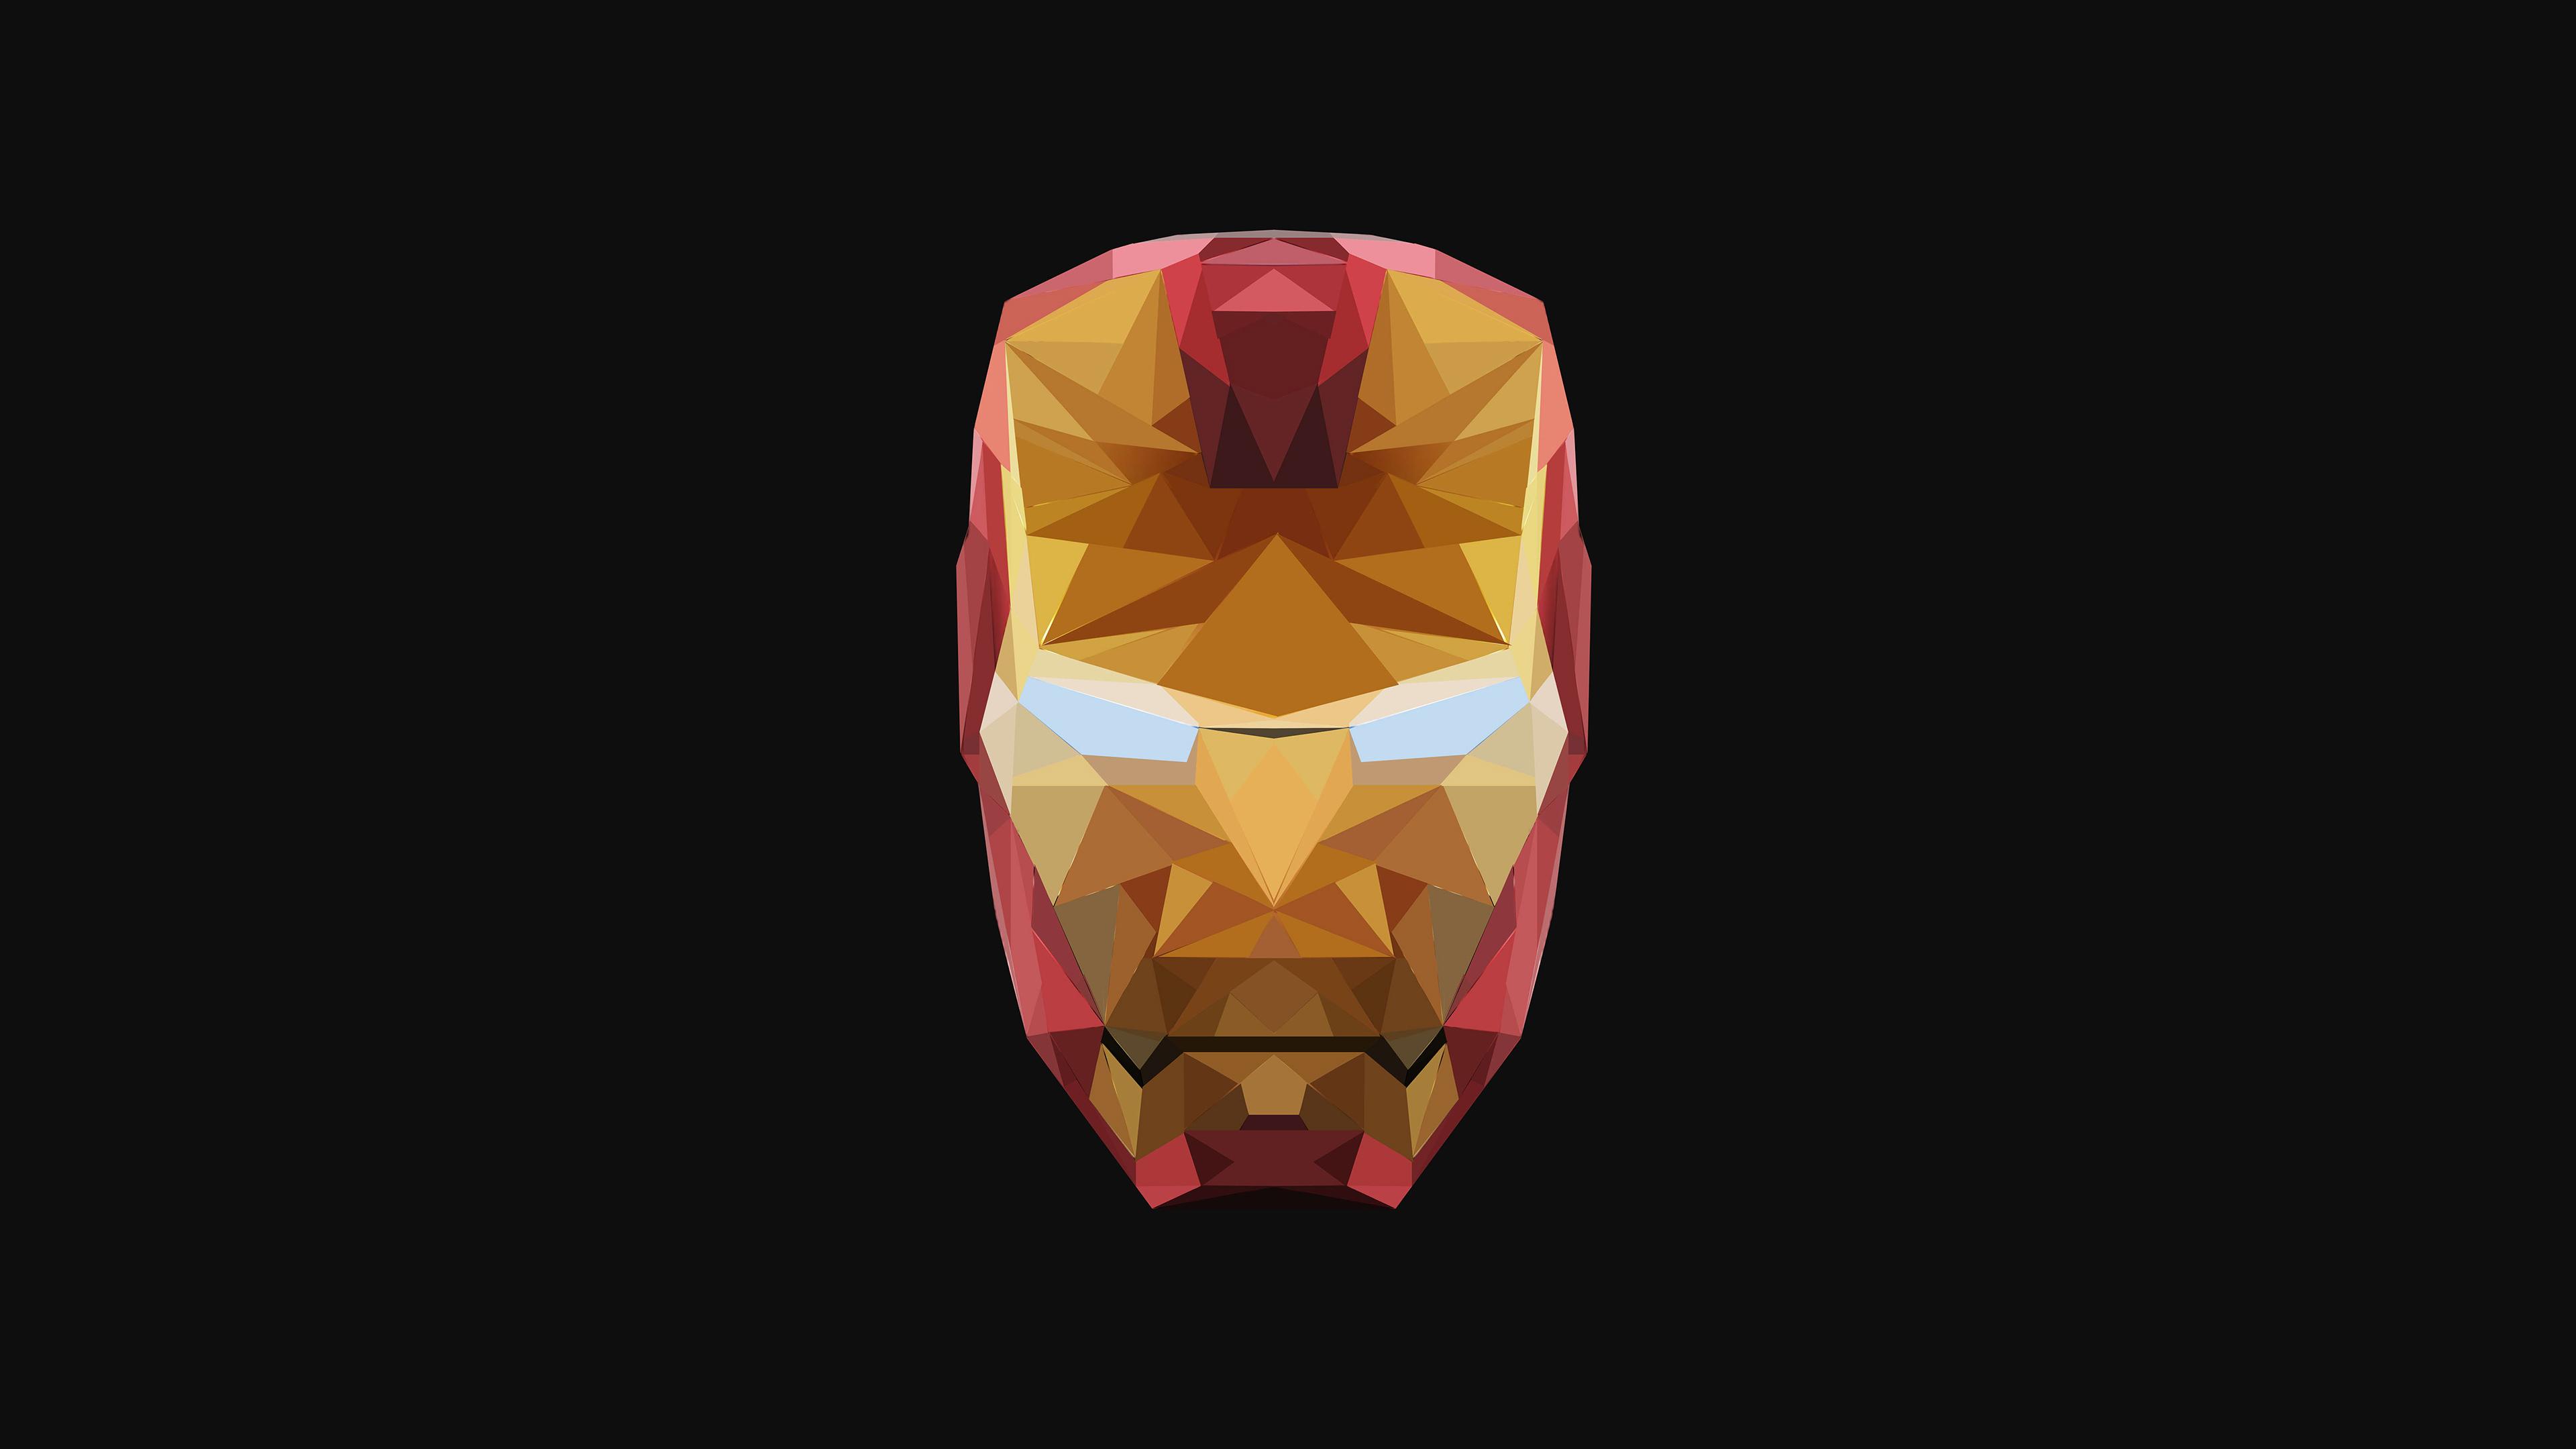 4k iron man low poly 1547506416 - 4k Iron Man Low Poly - superheroes wallpapers, low poly wallpapers, iron man wallpapers, hd-wallpapers, behance wallpapers, 4k-wallpapers